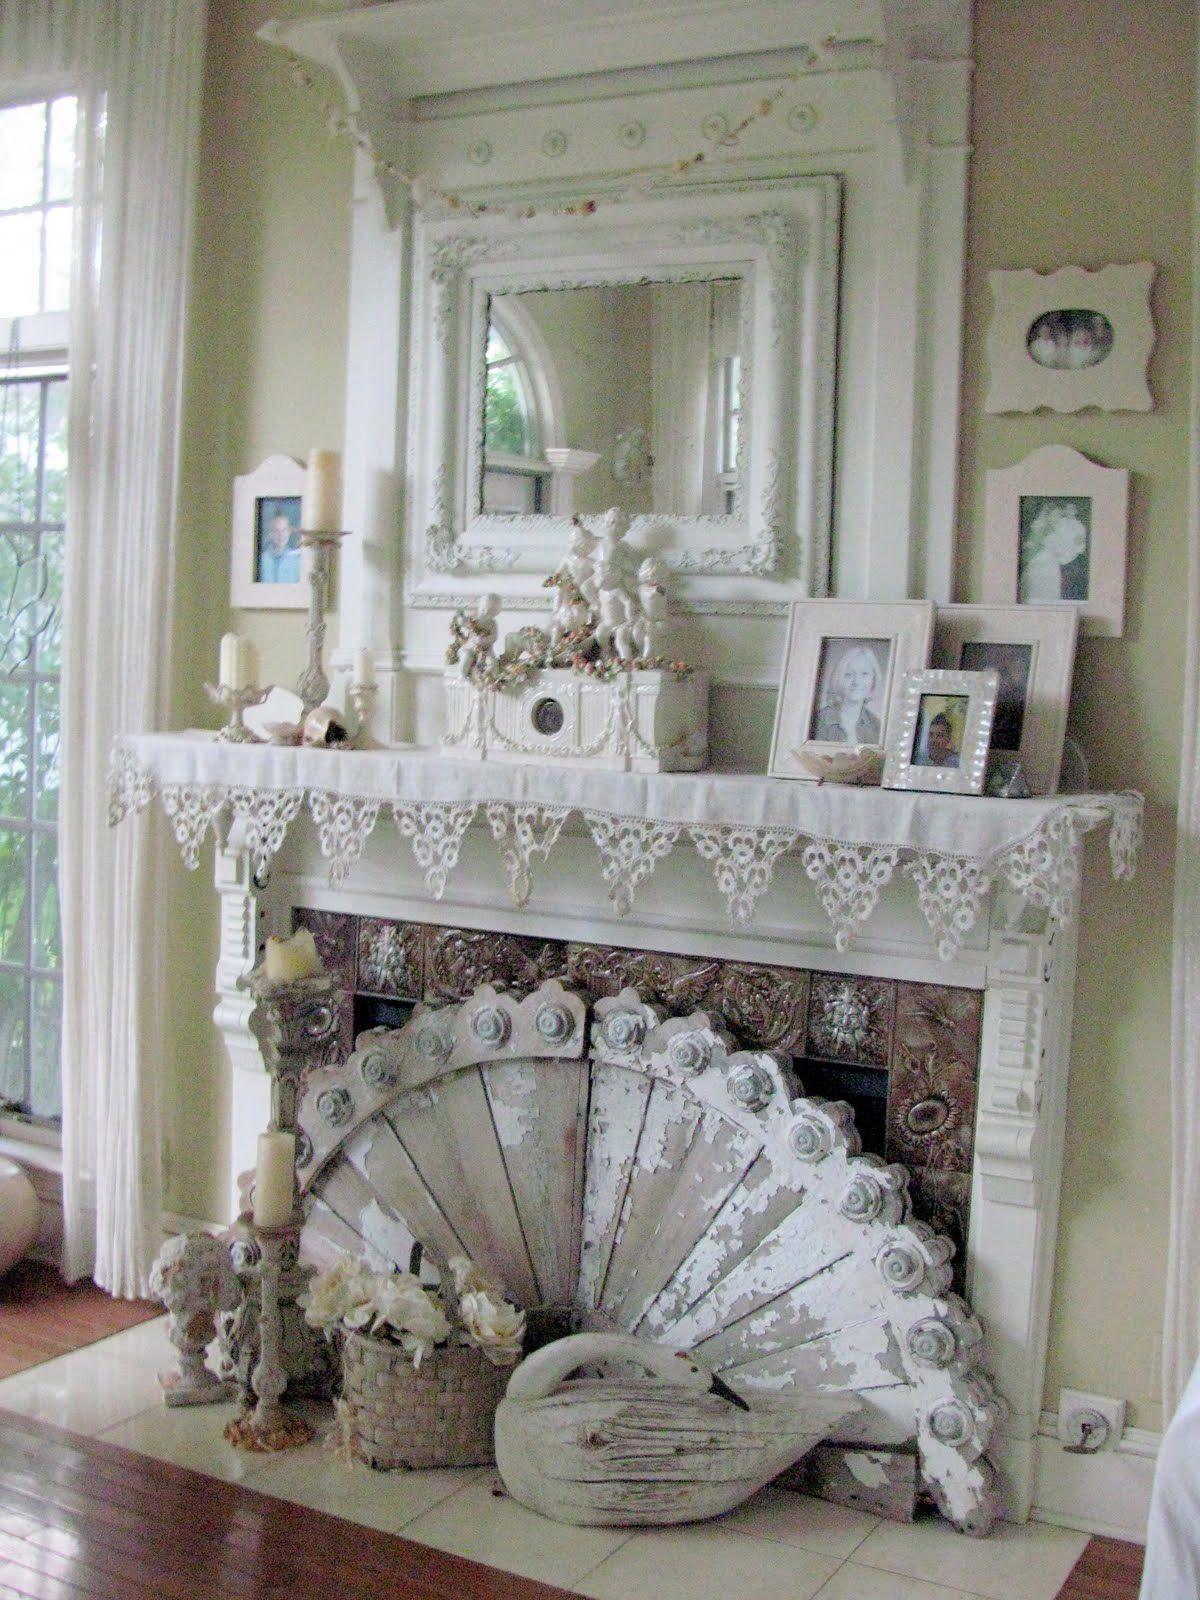 My Family Room Shabby chic fireplace, Shabby chic room